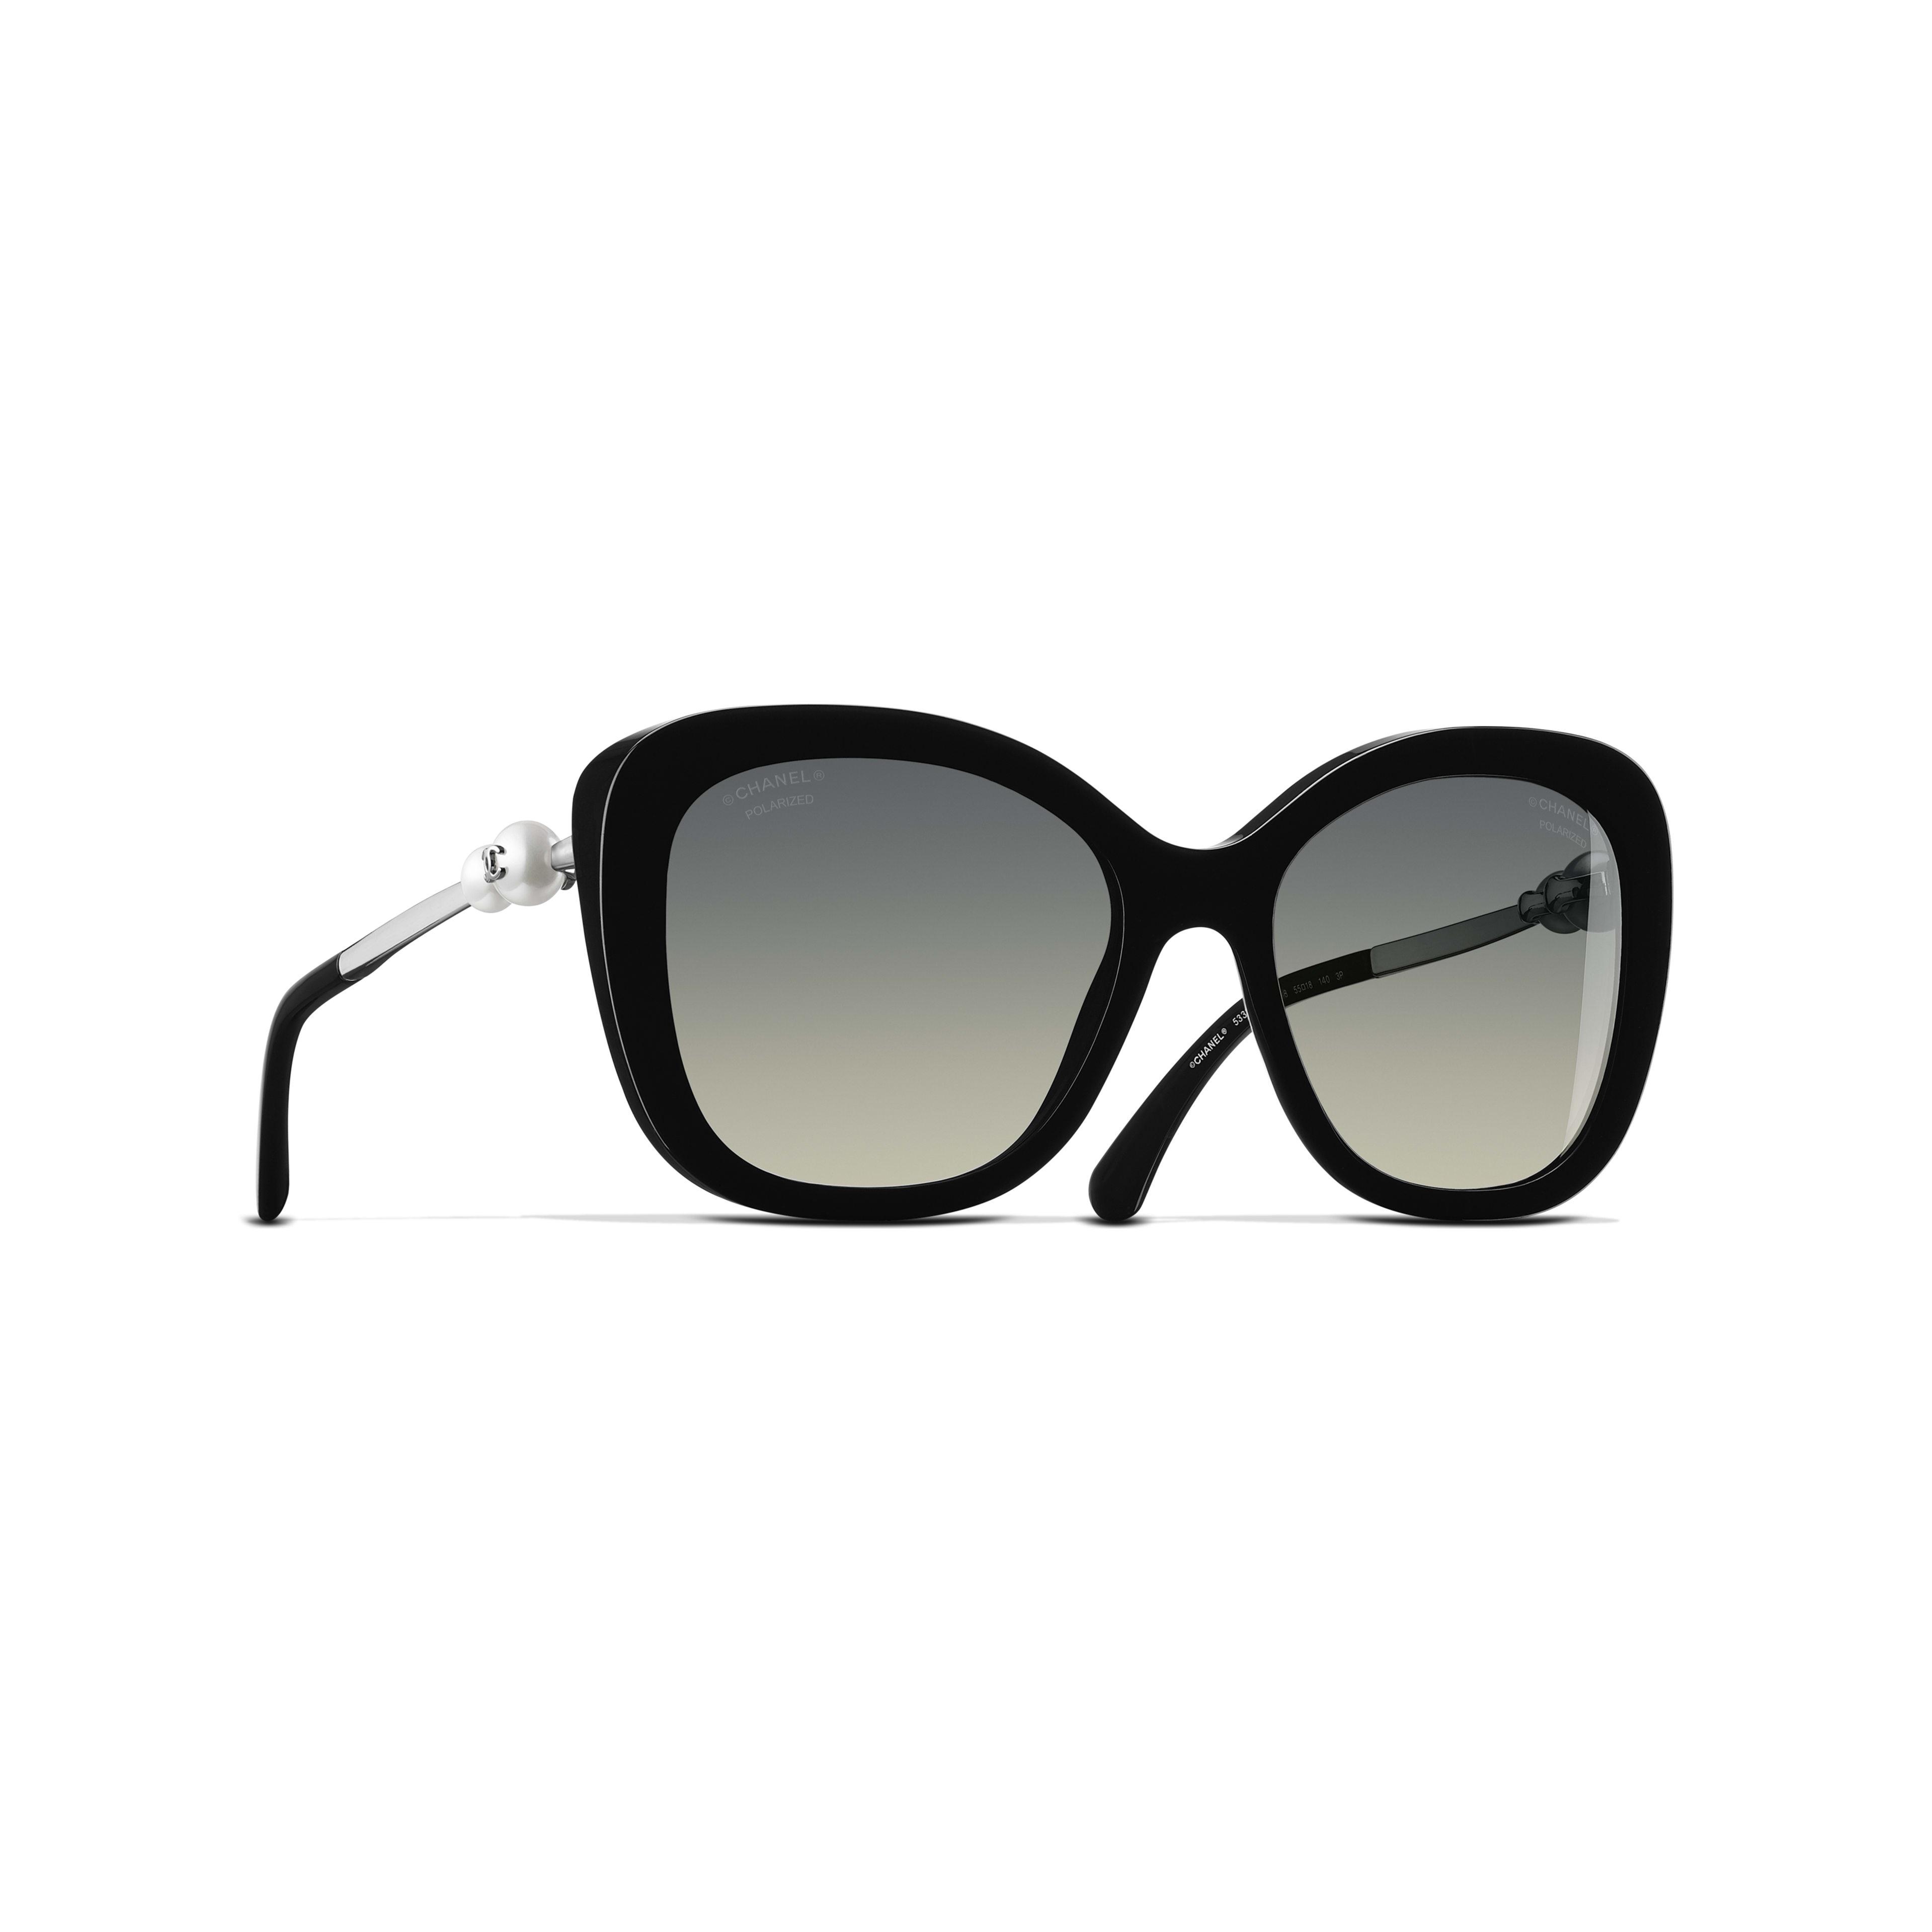 Square Sunglasses Acetate & Imitation Pearls - Polarized Lenses Black -                                               view 1 - see full sized version